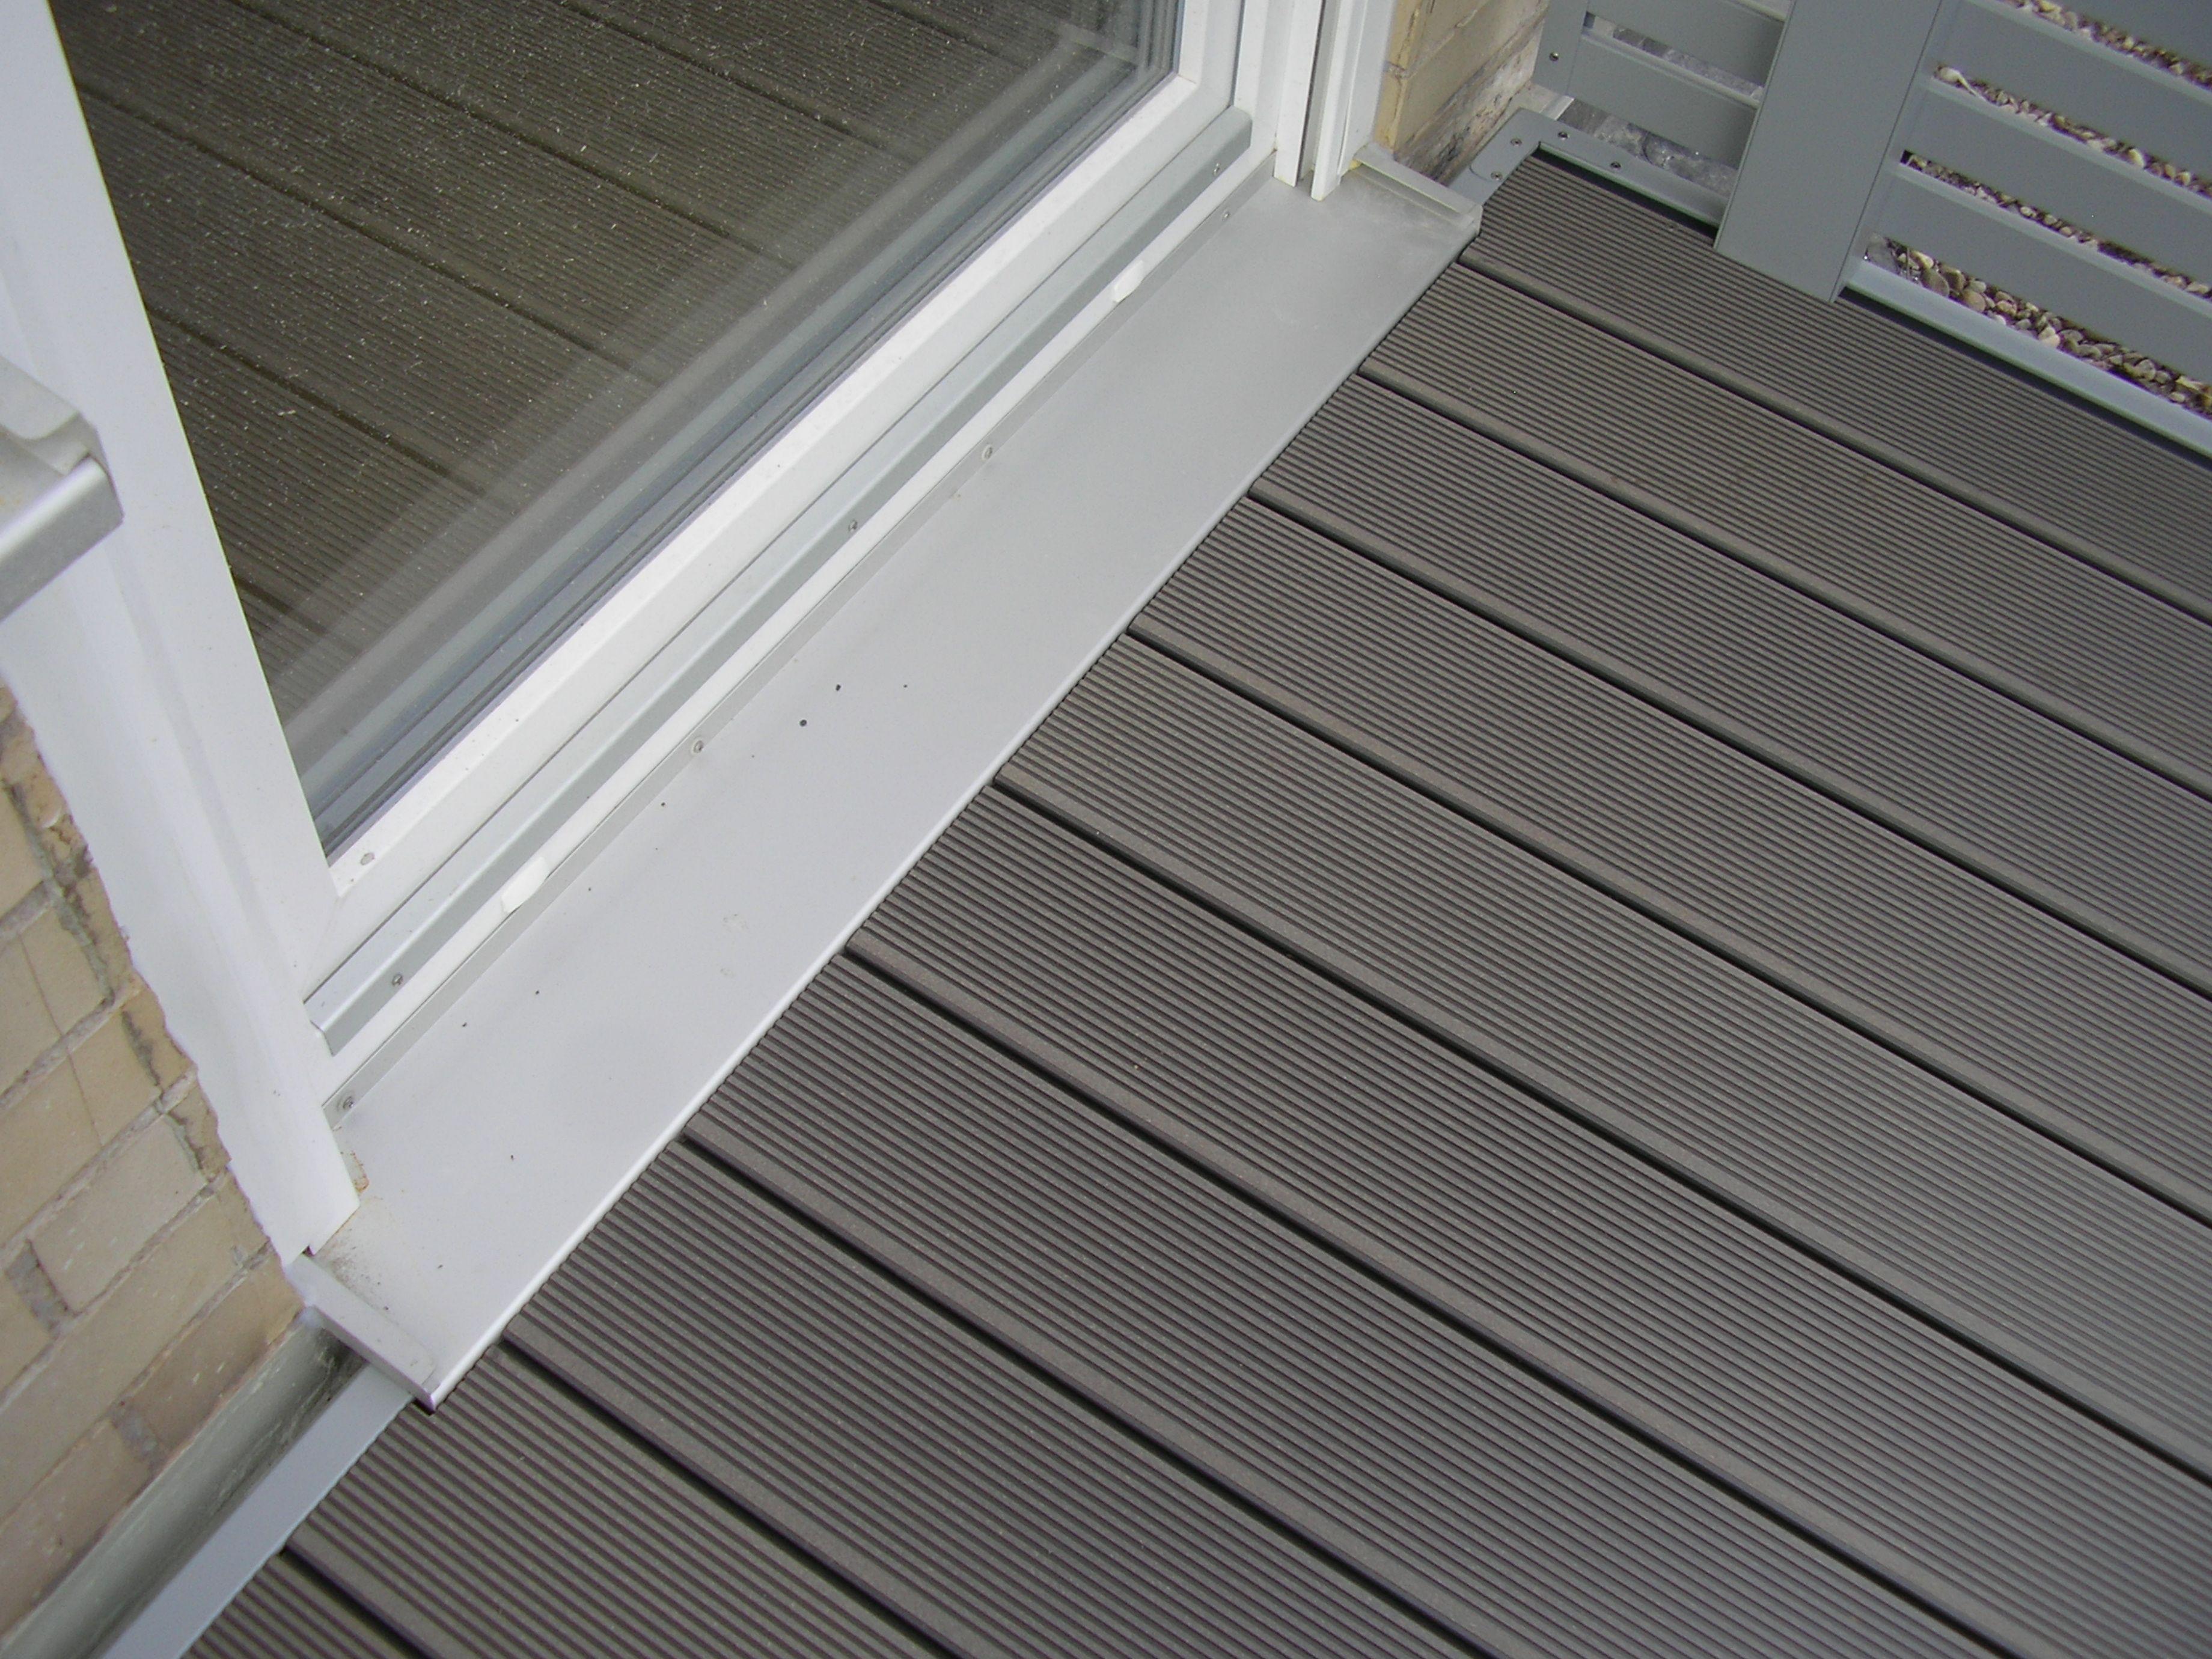 Fußboden Balkon Günstig ~ Wpc boden türausschnitt leeb balkonböden wpc boden boden und